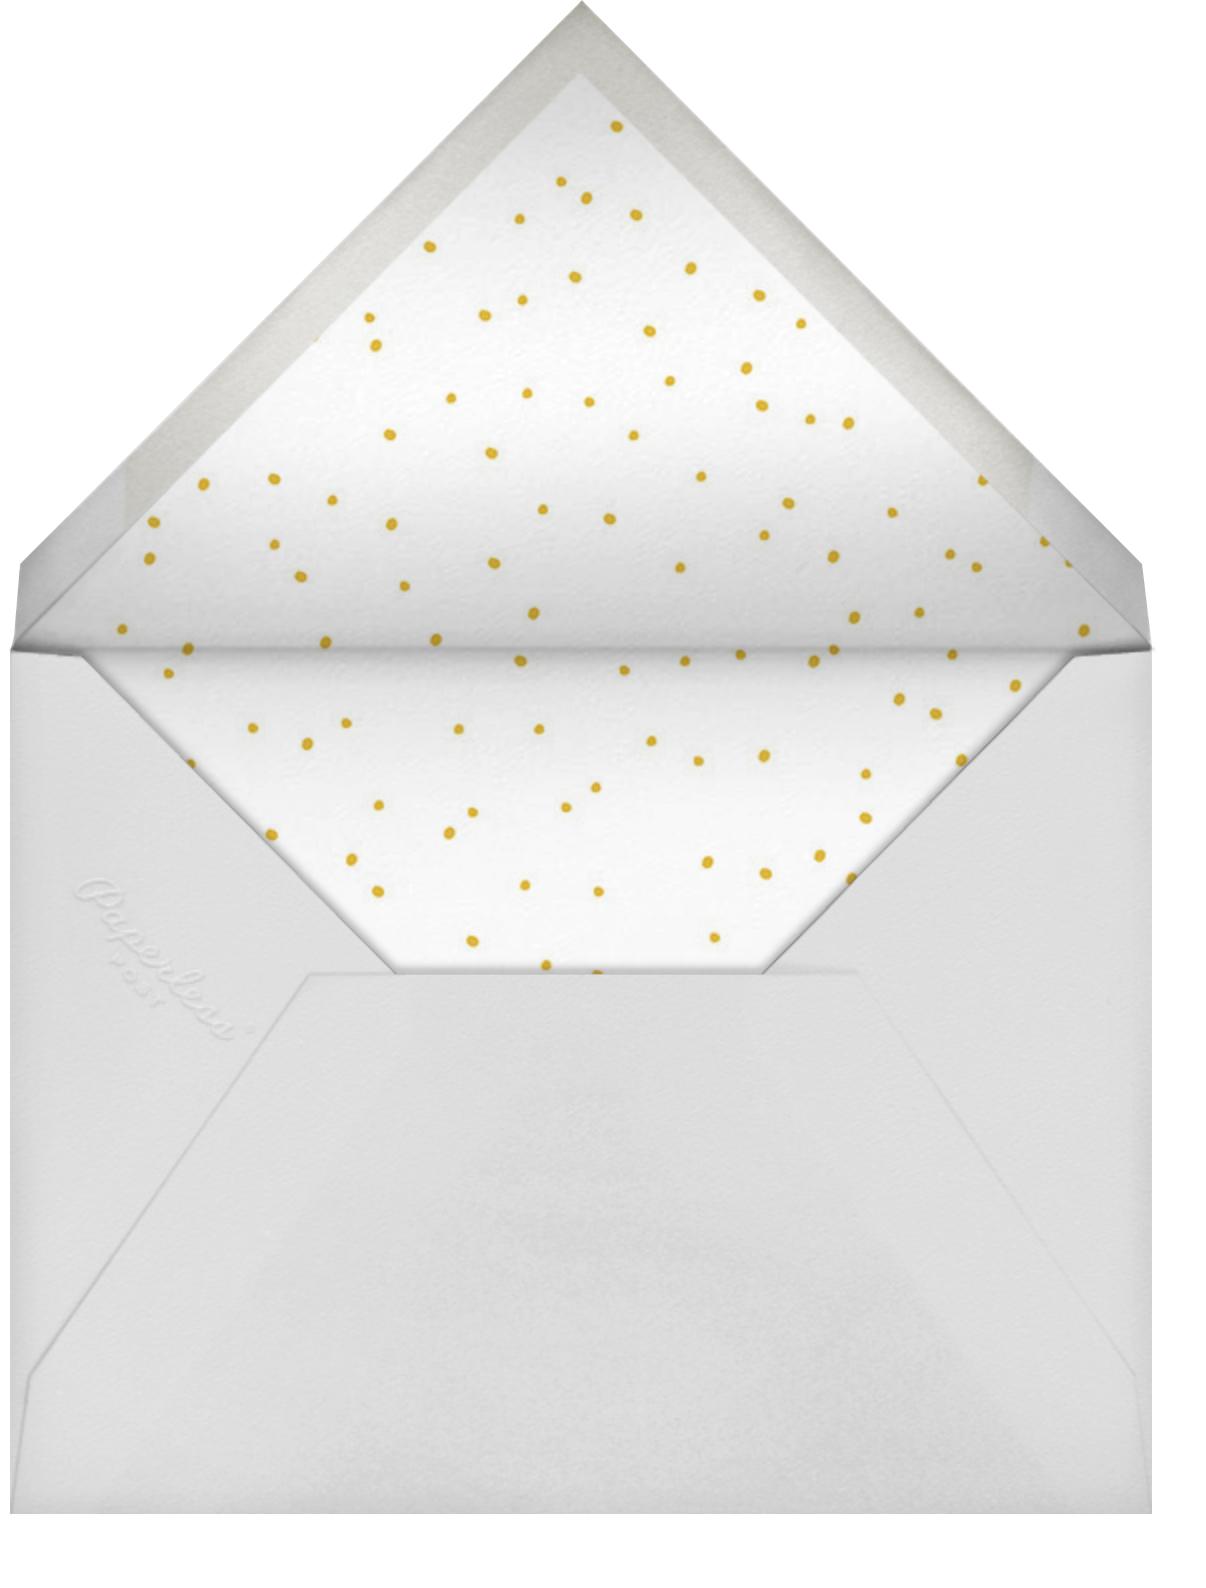 Pineapple Party - Linda and Harriett - Bachelorette party - envelope back